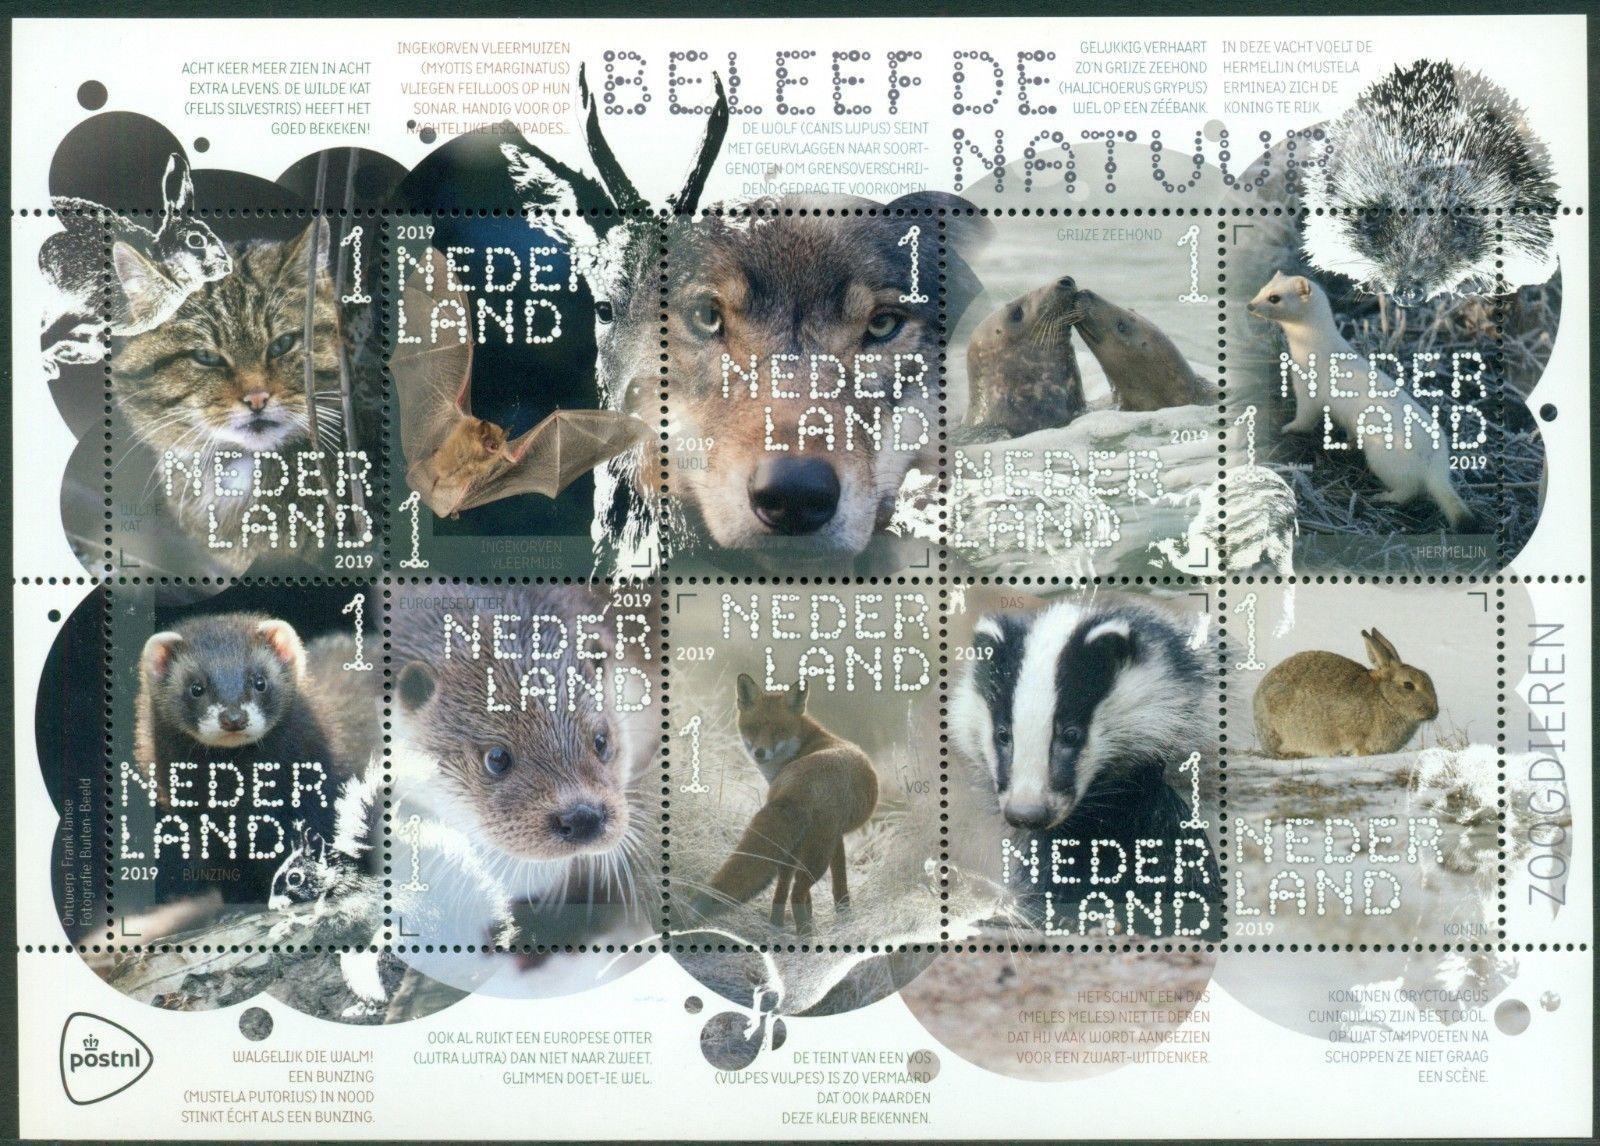 Netherlands - Experience Nature (January 2, 2019) miniature sheet of 10